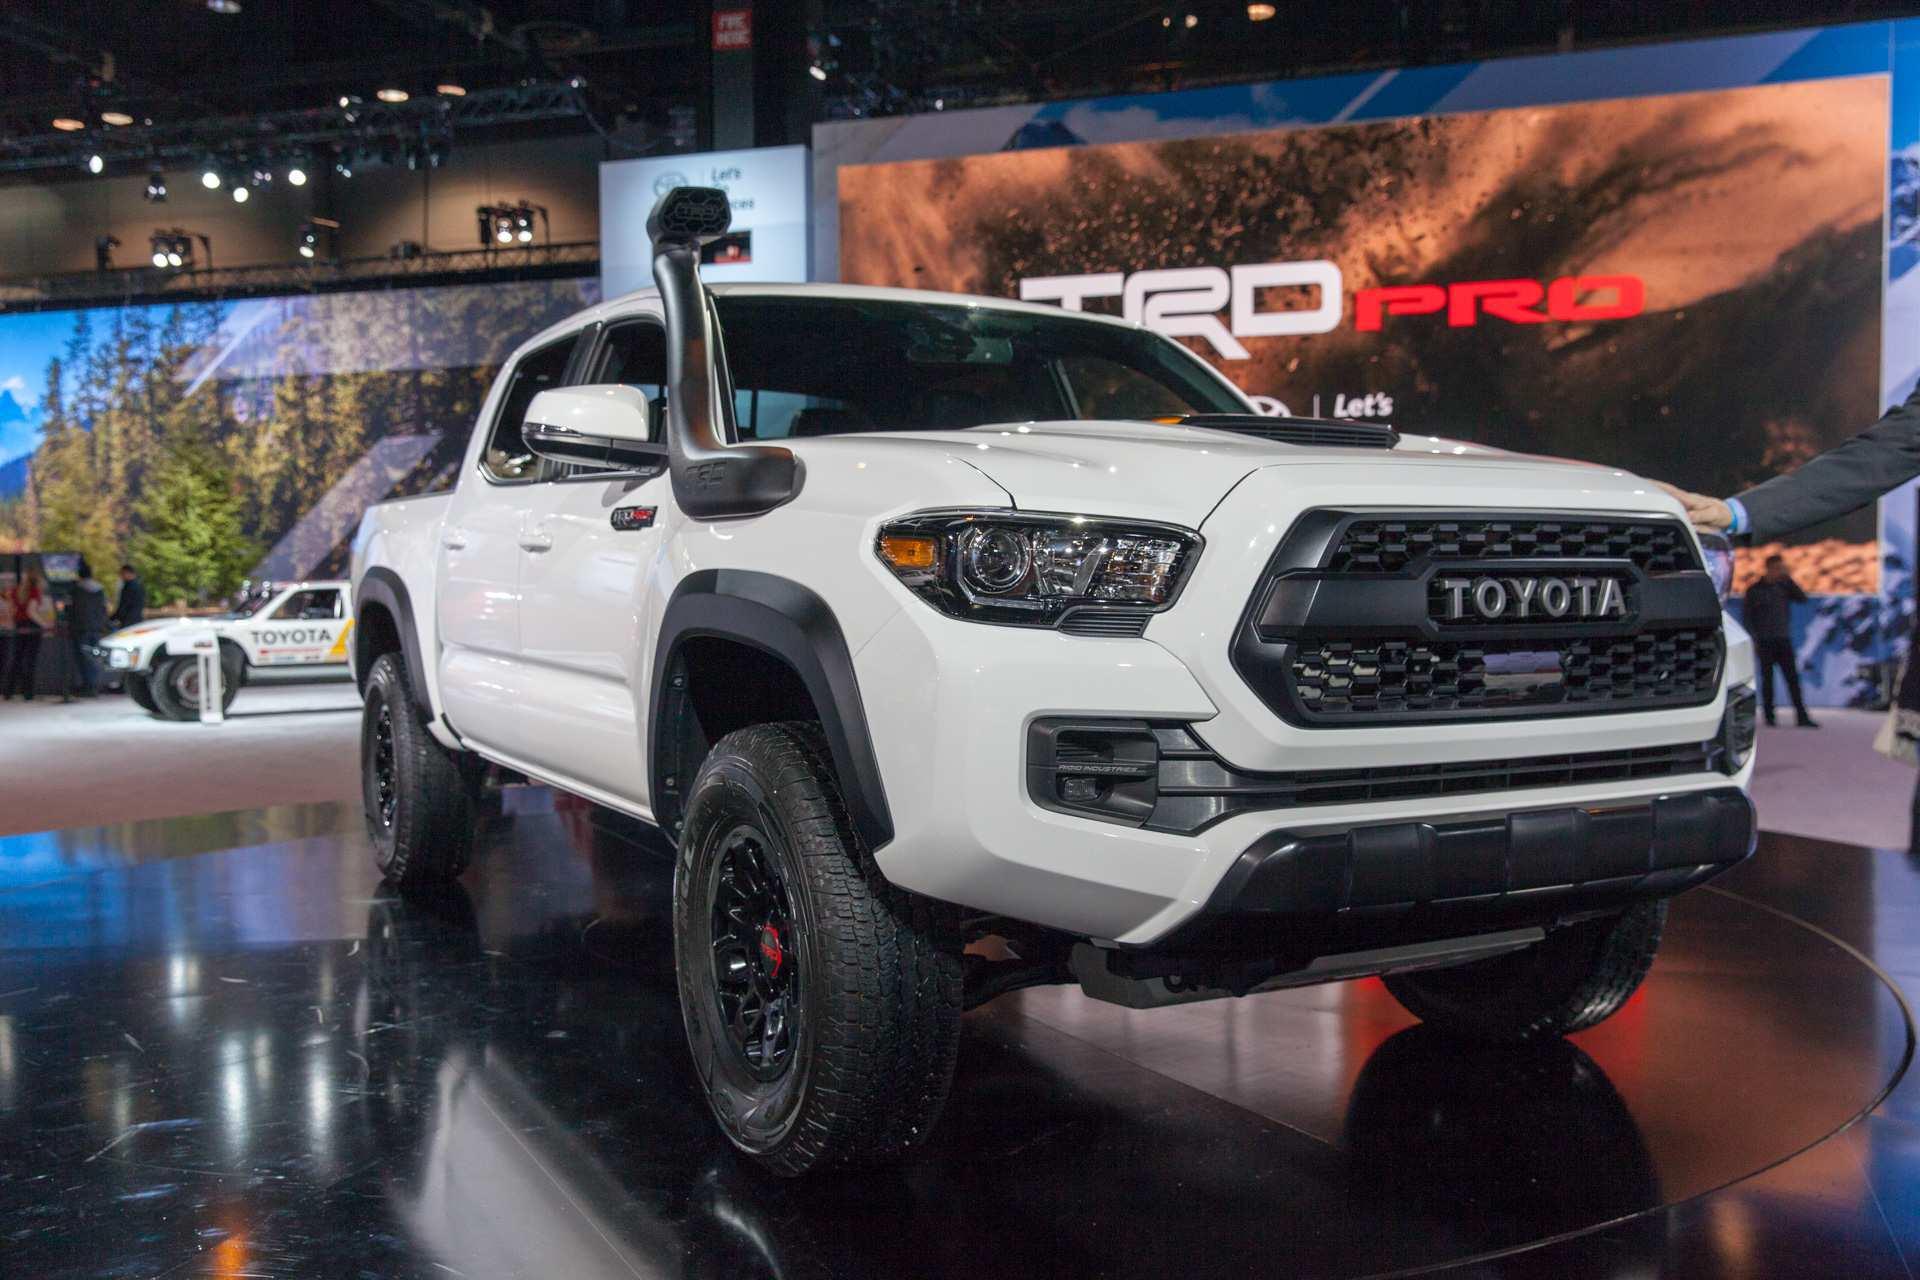 31 Concept of 2019 Toyota Tundra Concept Interior for 2019 Toyota Tundra Concept